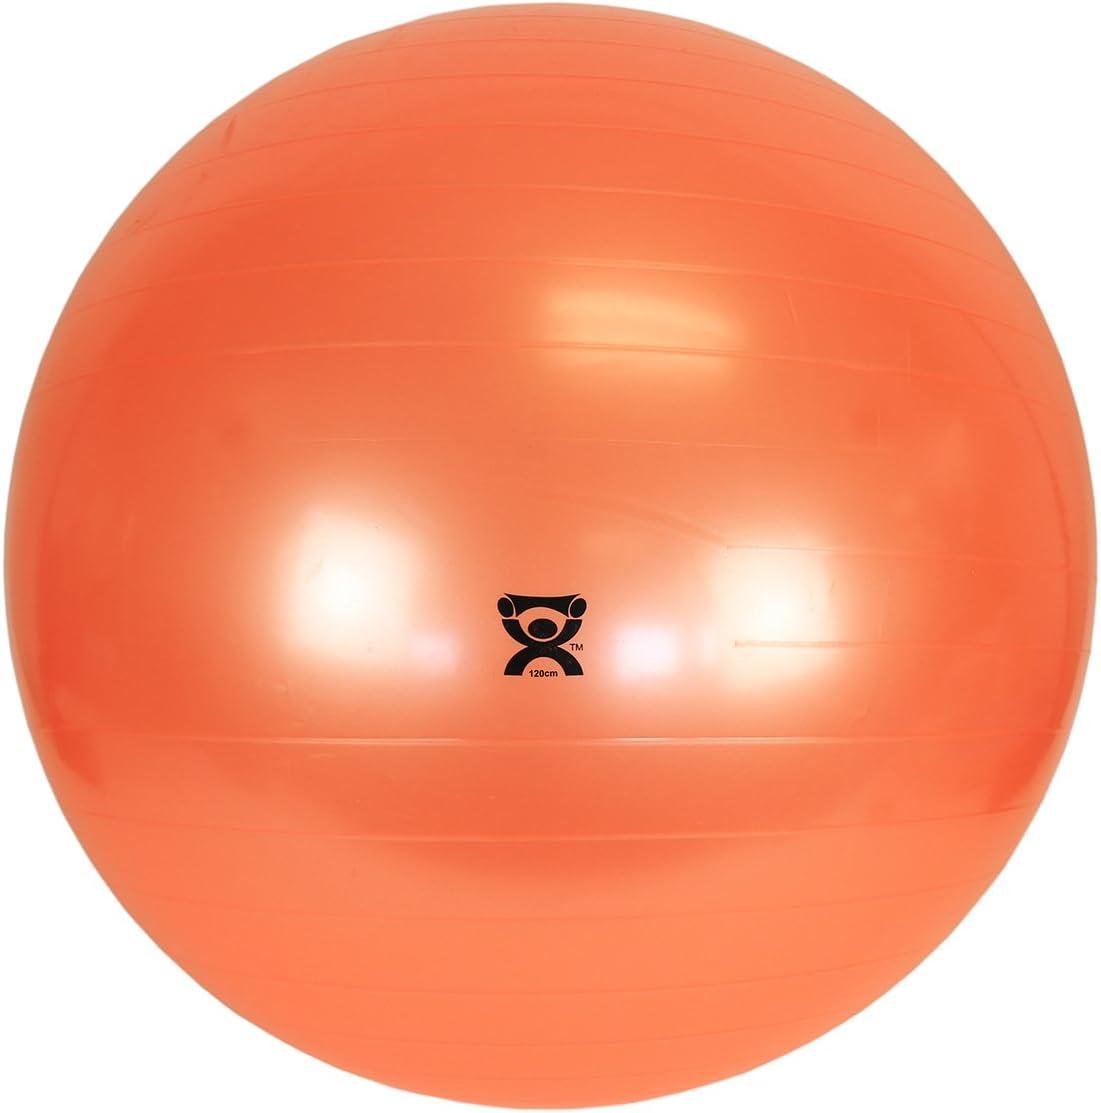 "Cando 30-1800 Blue Non-Slip PVC Vinyl Inflatable Exercise Ball, 12"" Diameter, 300 lbs Weight Capacity"